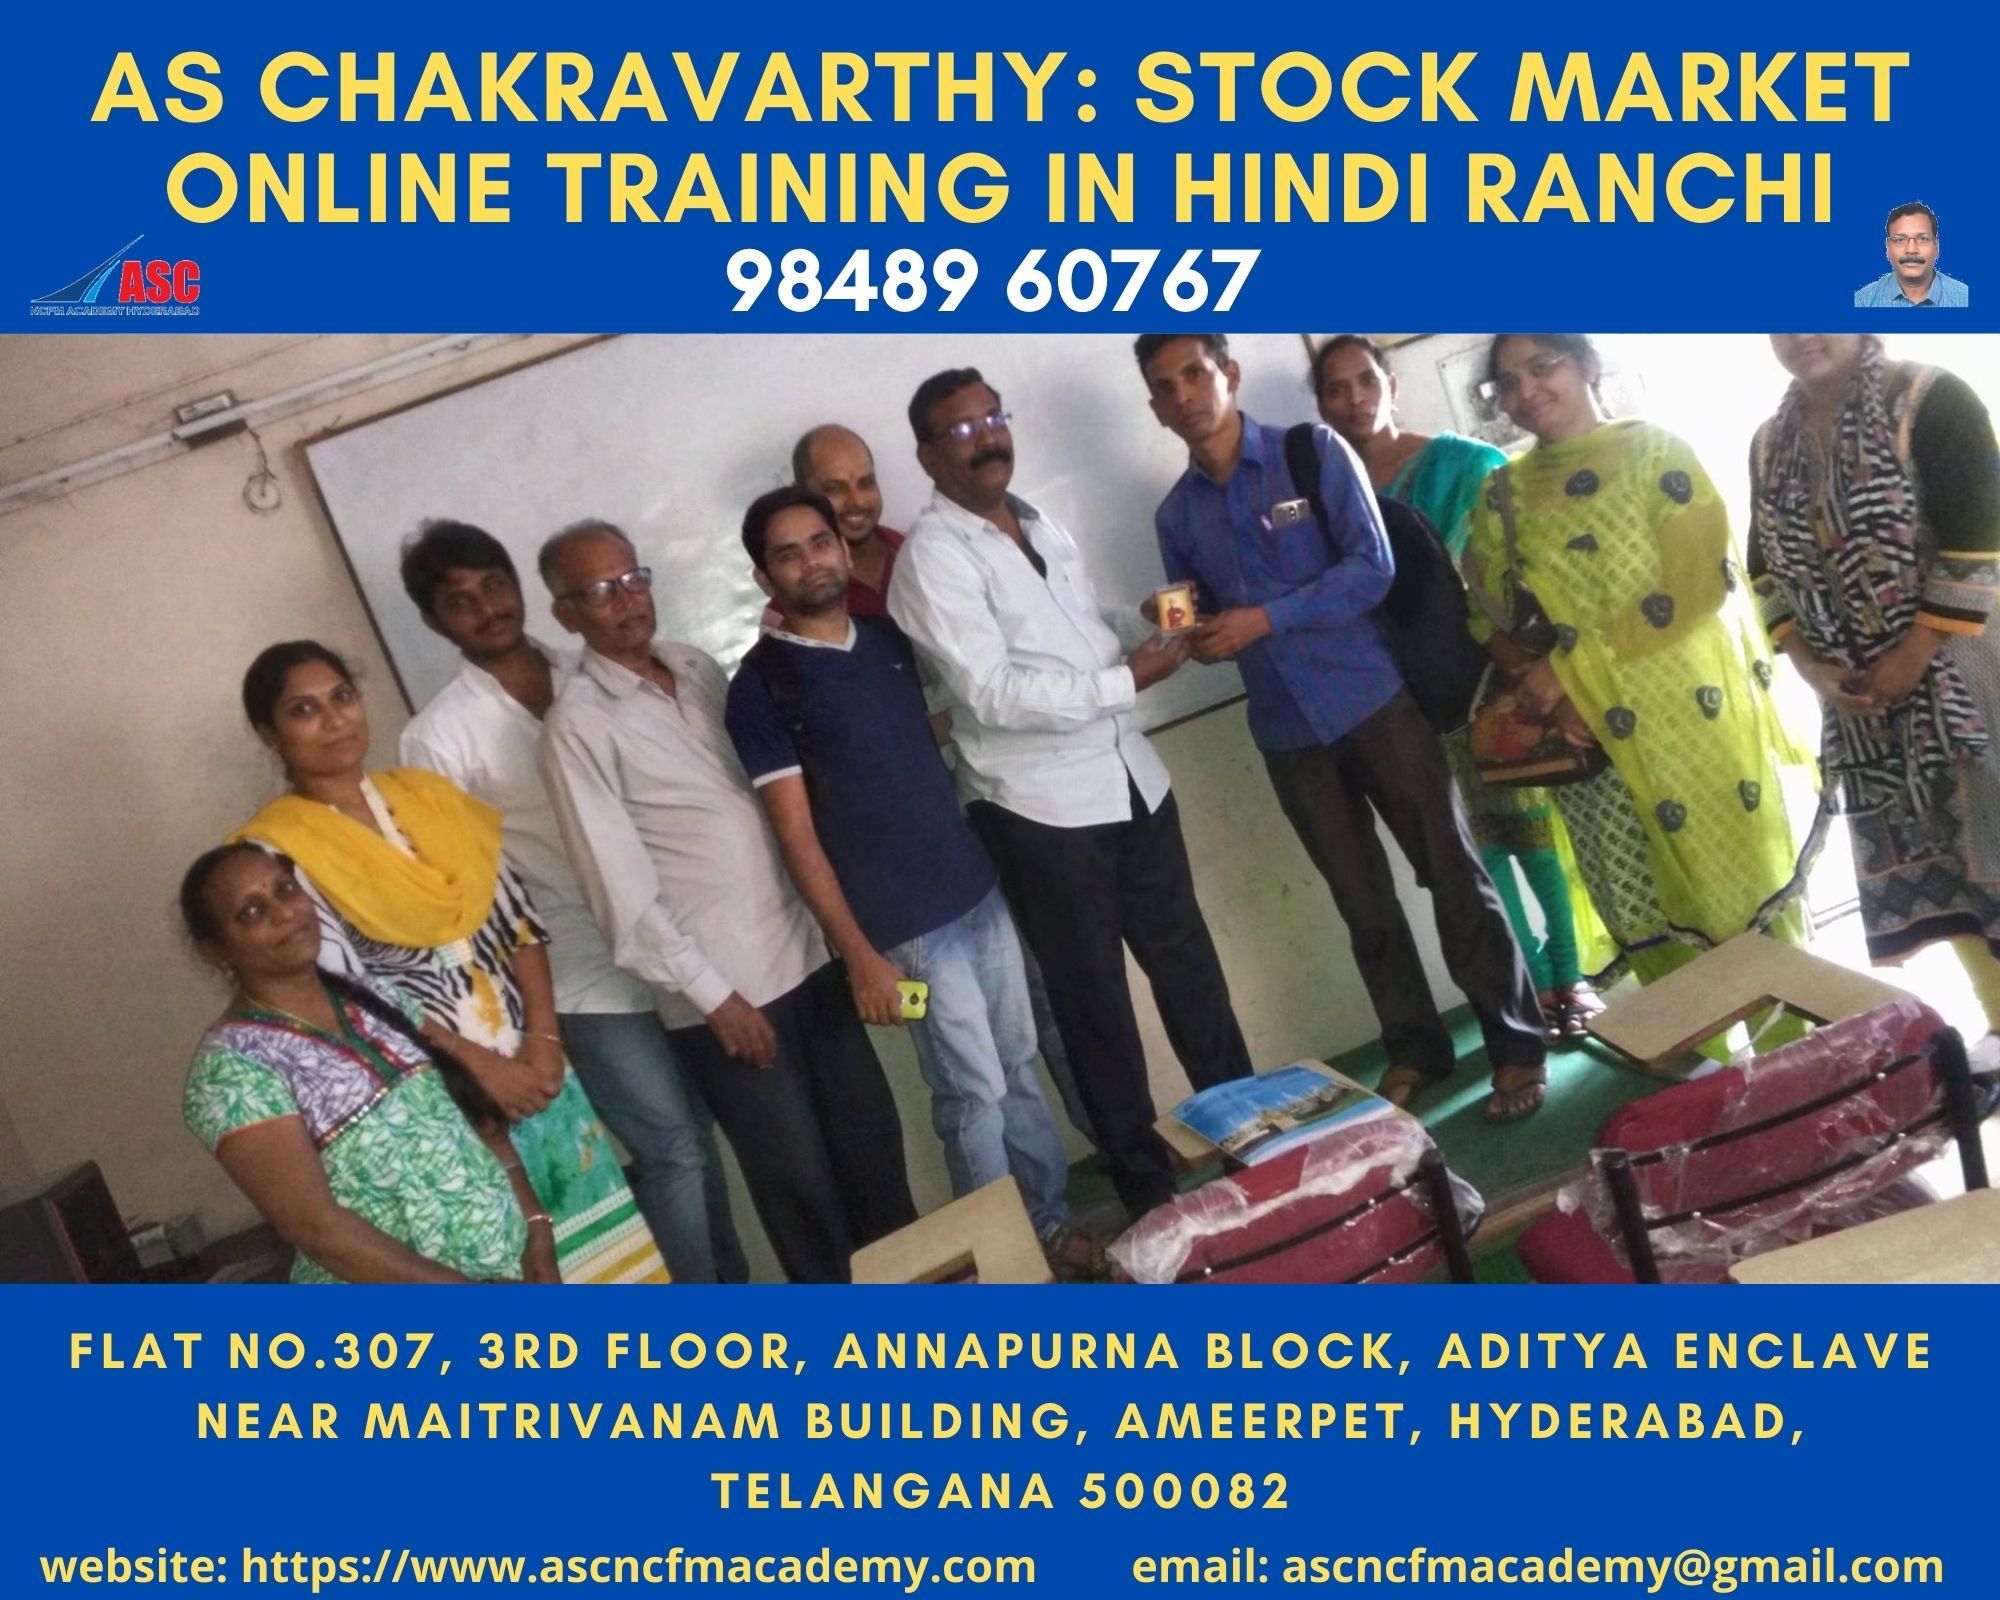 Online Stock Market Technical Training in Hindi Ranchi